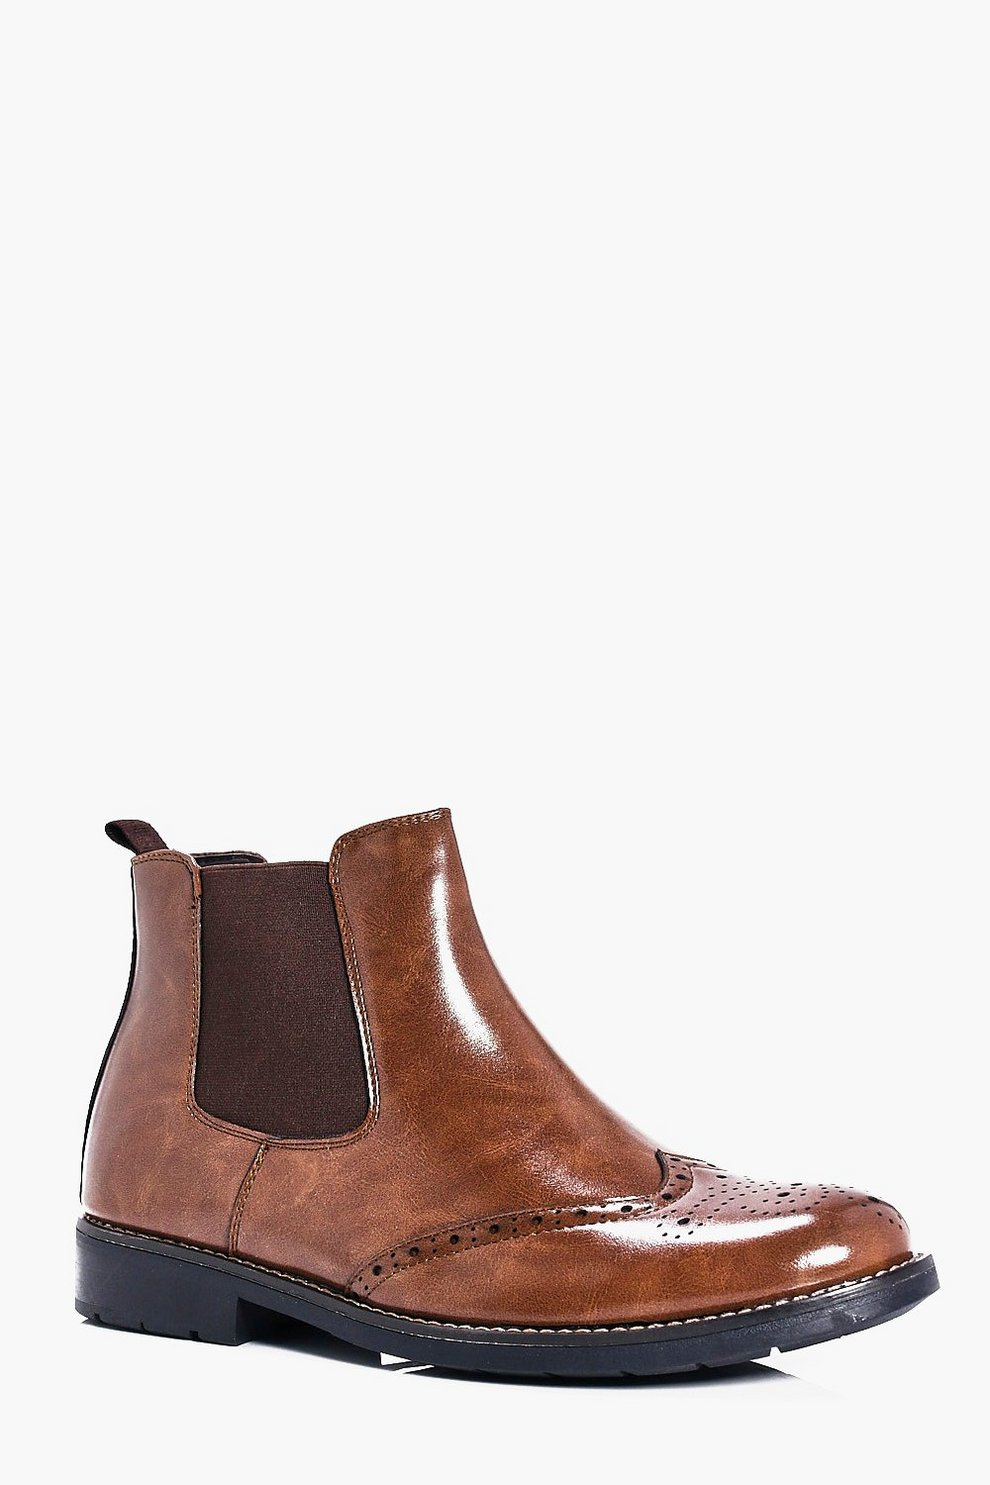 Brogue Detail Chelsea Boots | Boohoo